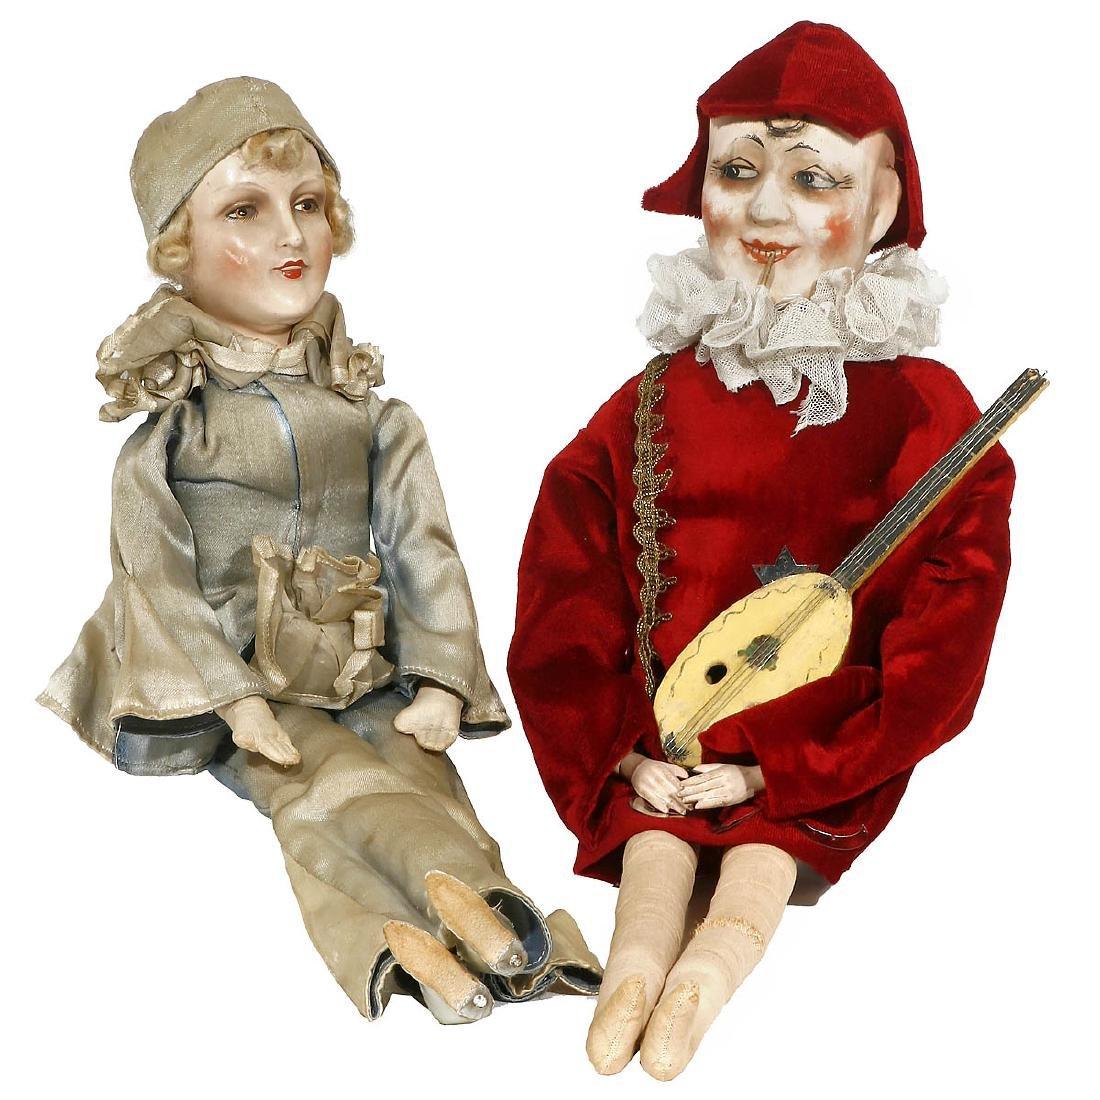 2 Musical Boudoir Dolls, c. 1930